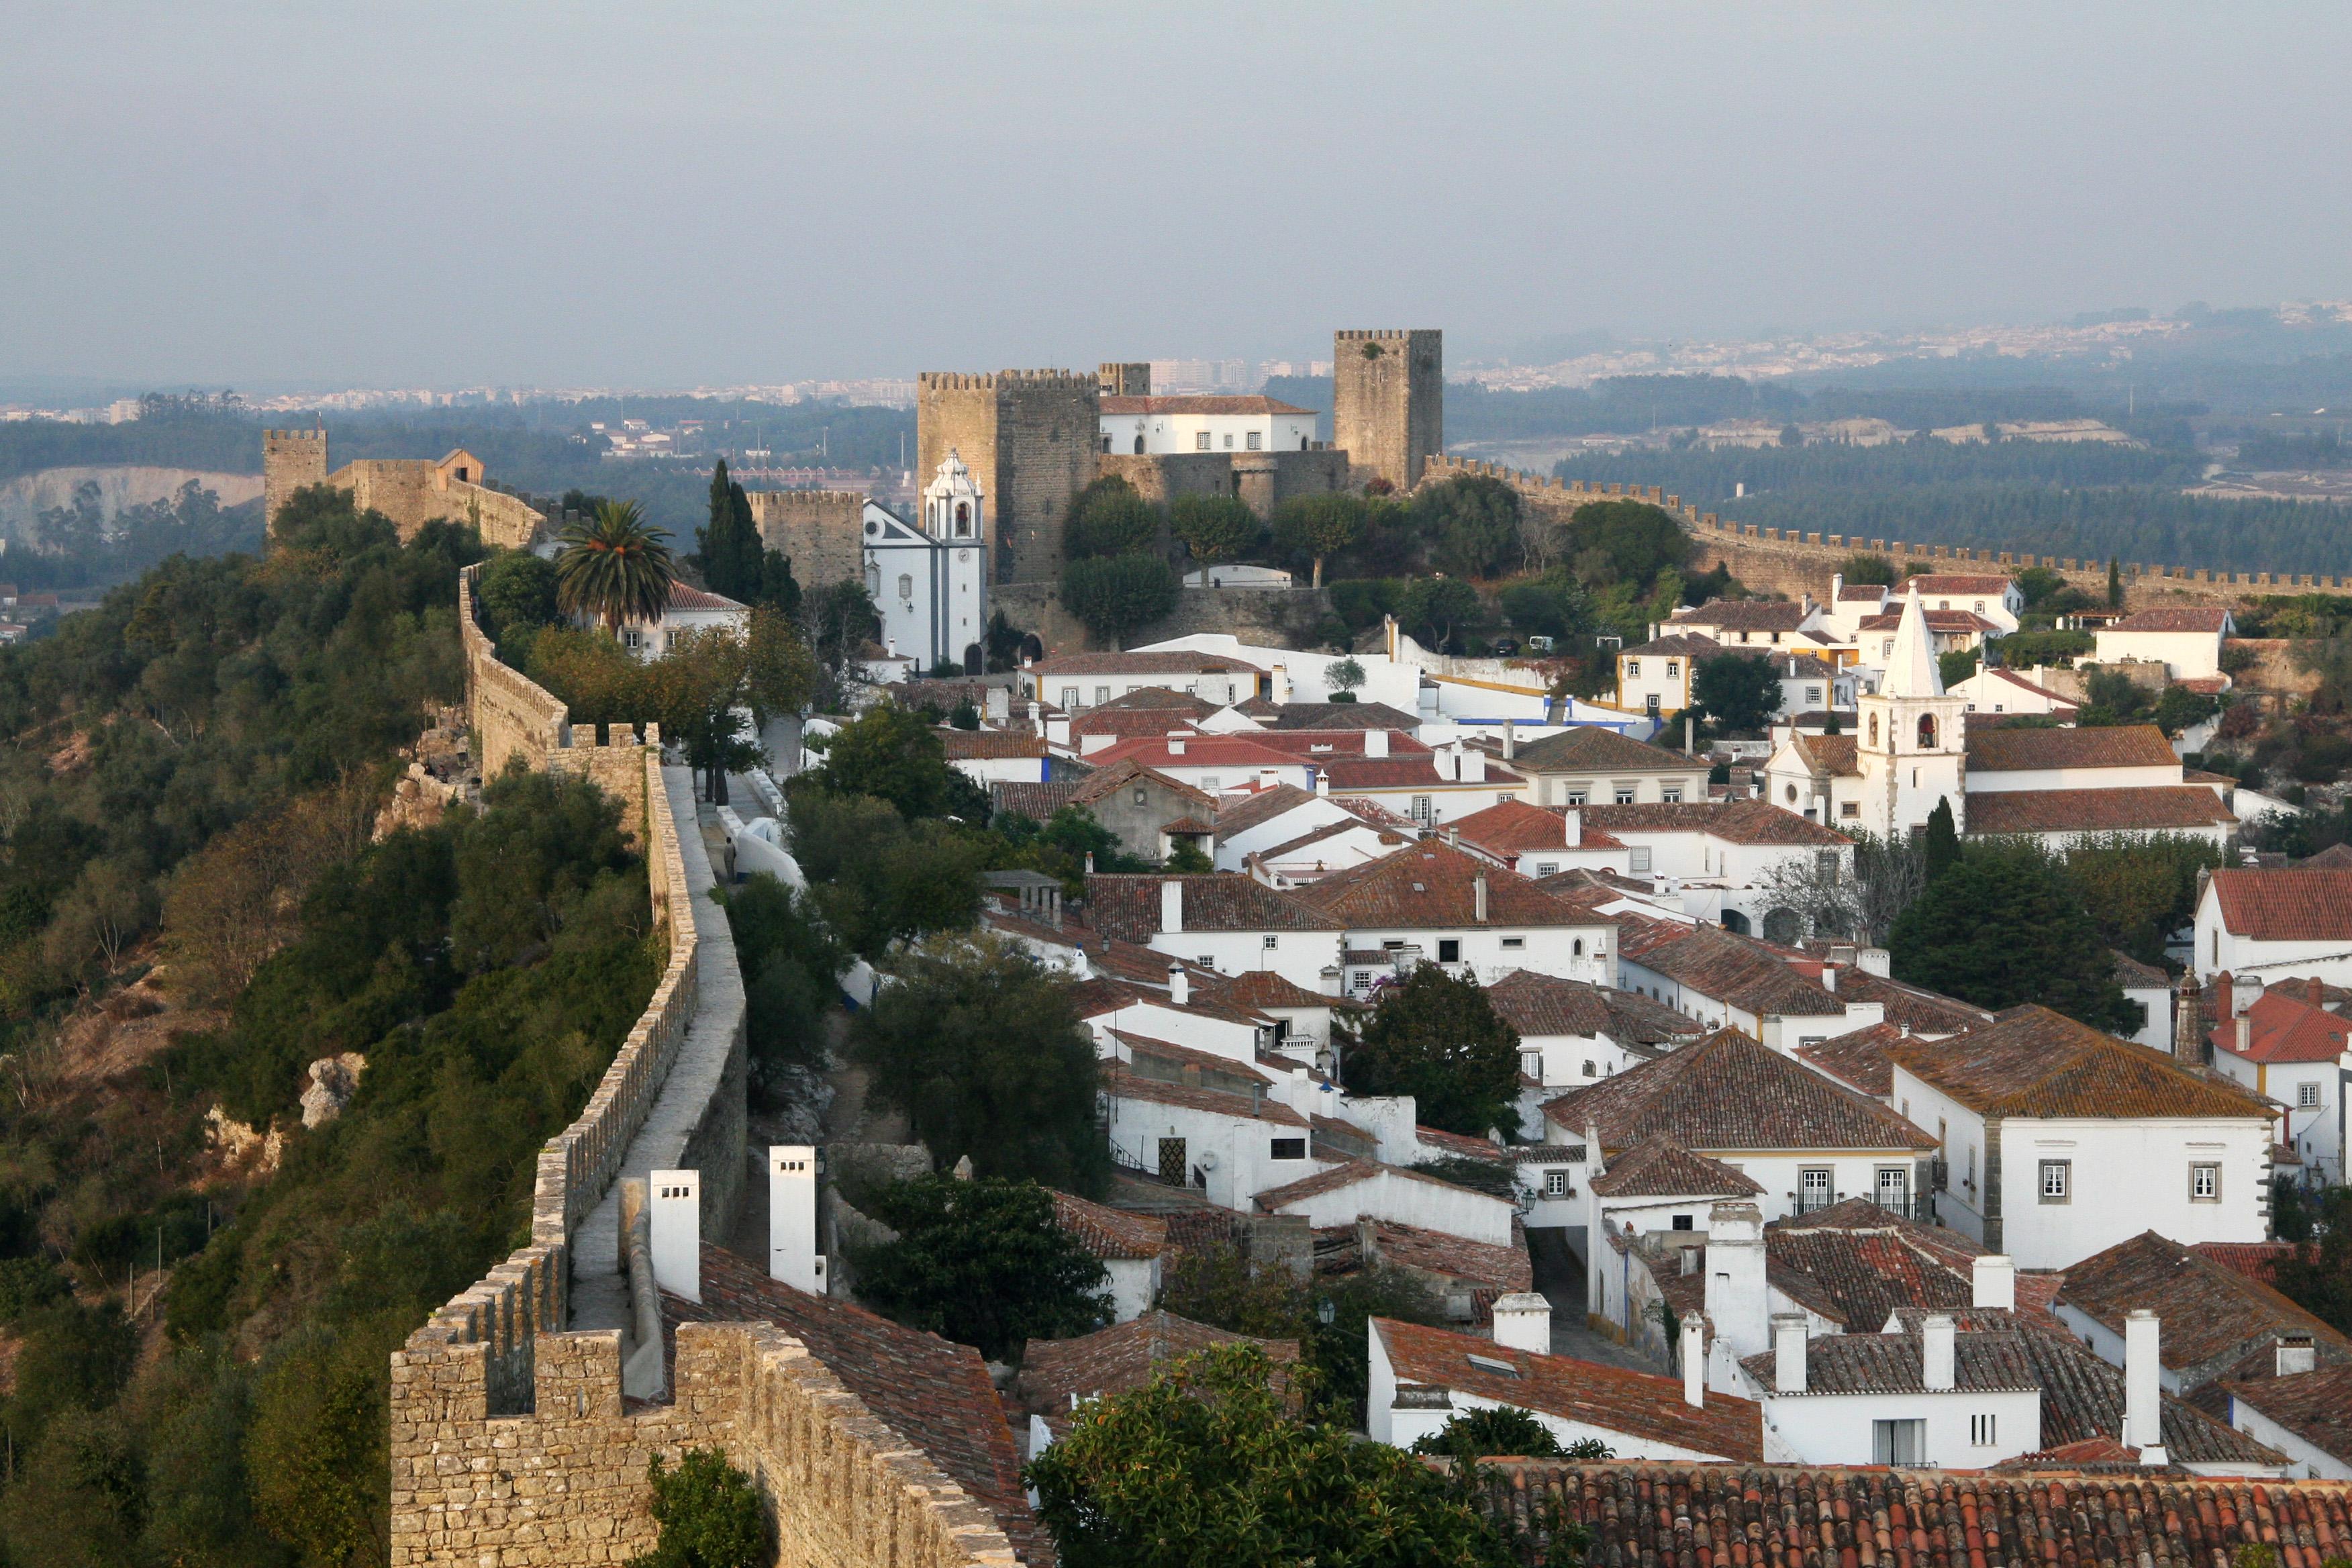 Óbidos, Portugal [3504 × 2336] : VillagePorn